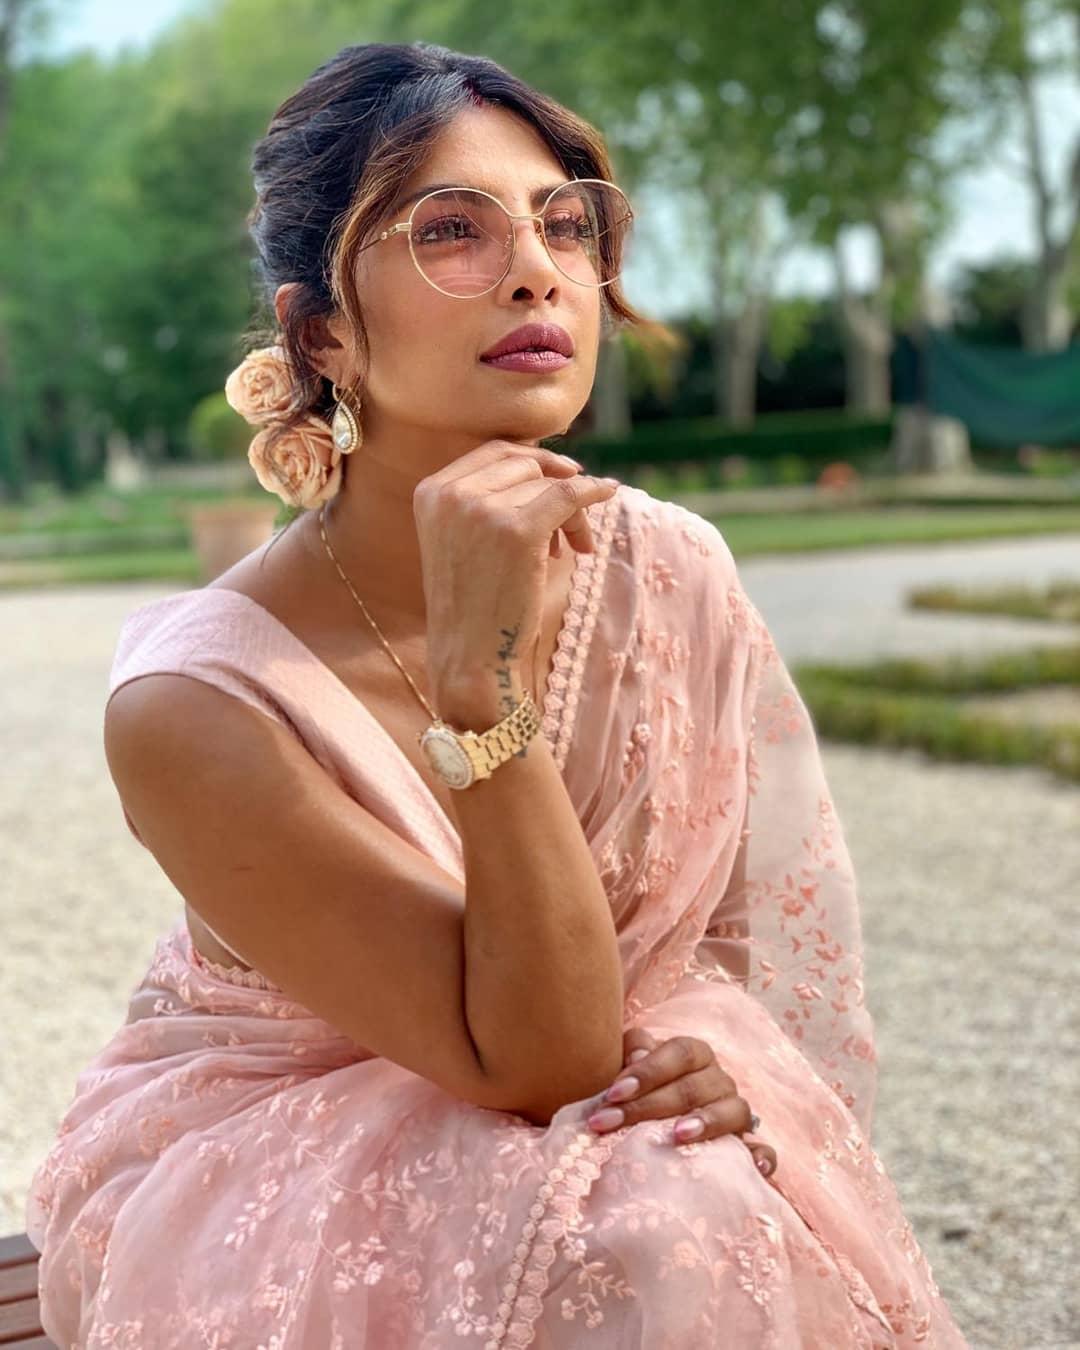 Priyanka-Chopra-Jonas-Wallpapers-Insta-Fit-Bio-6